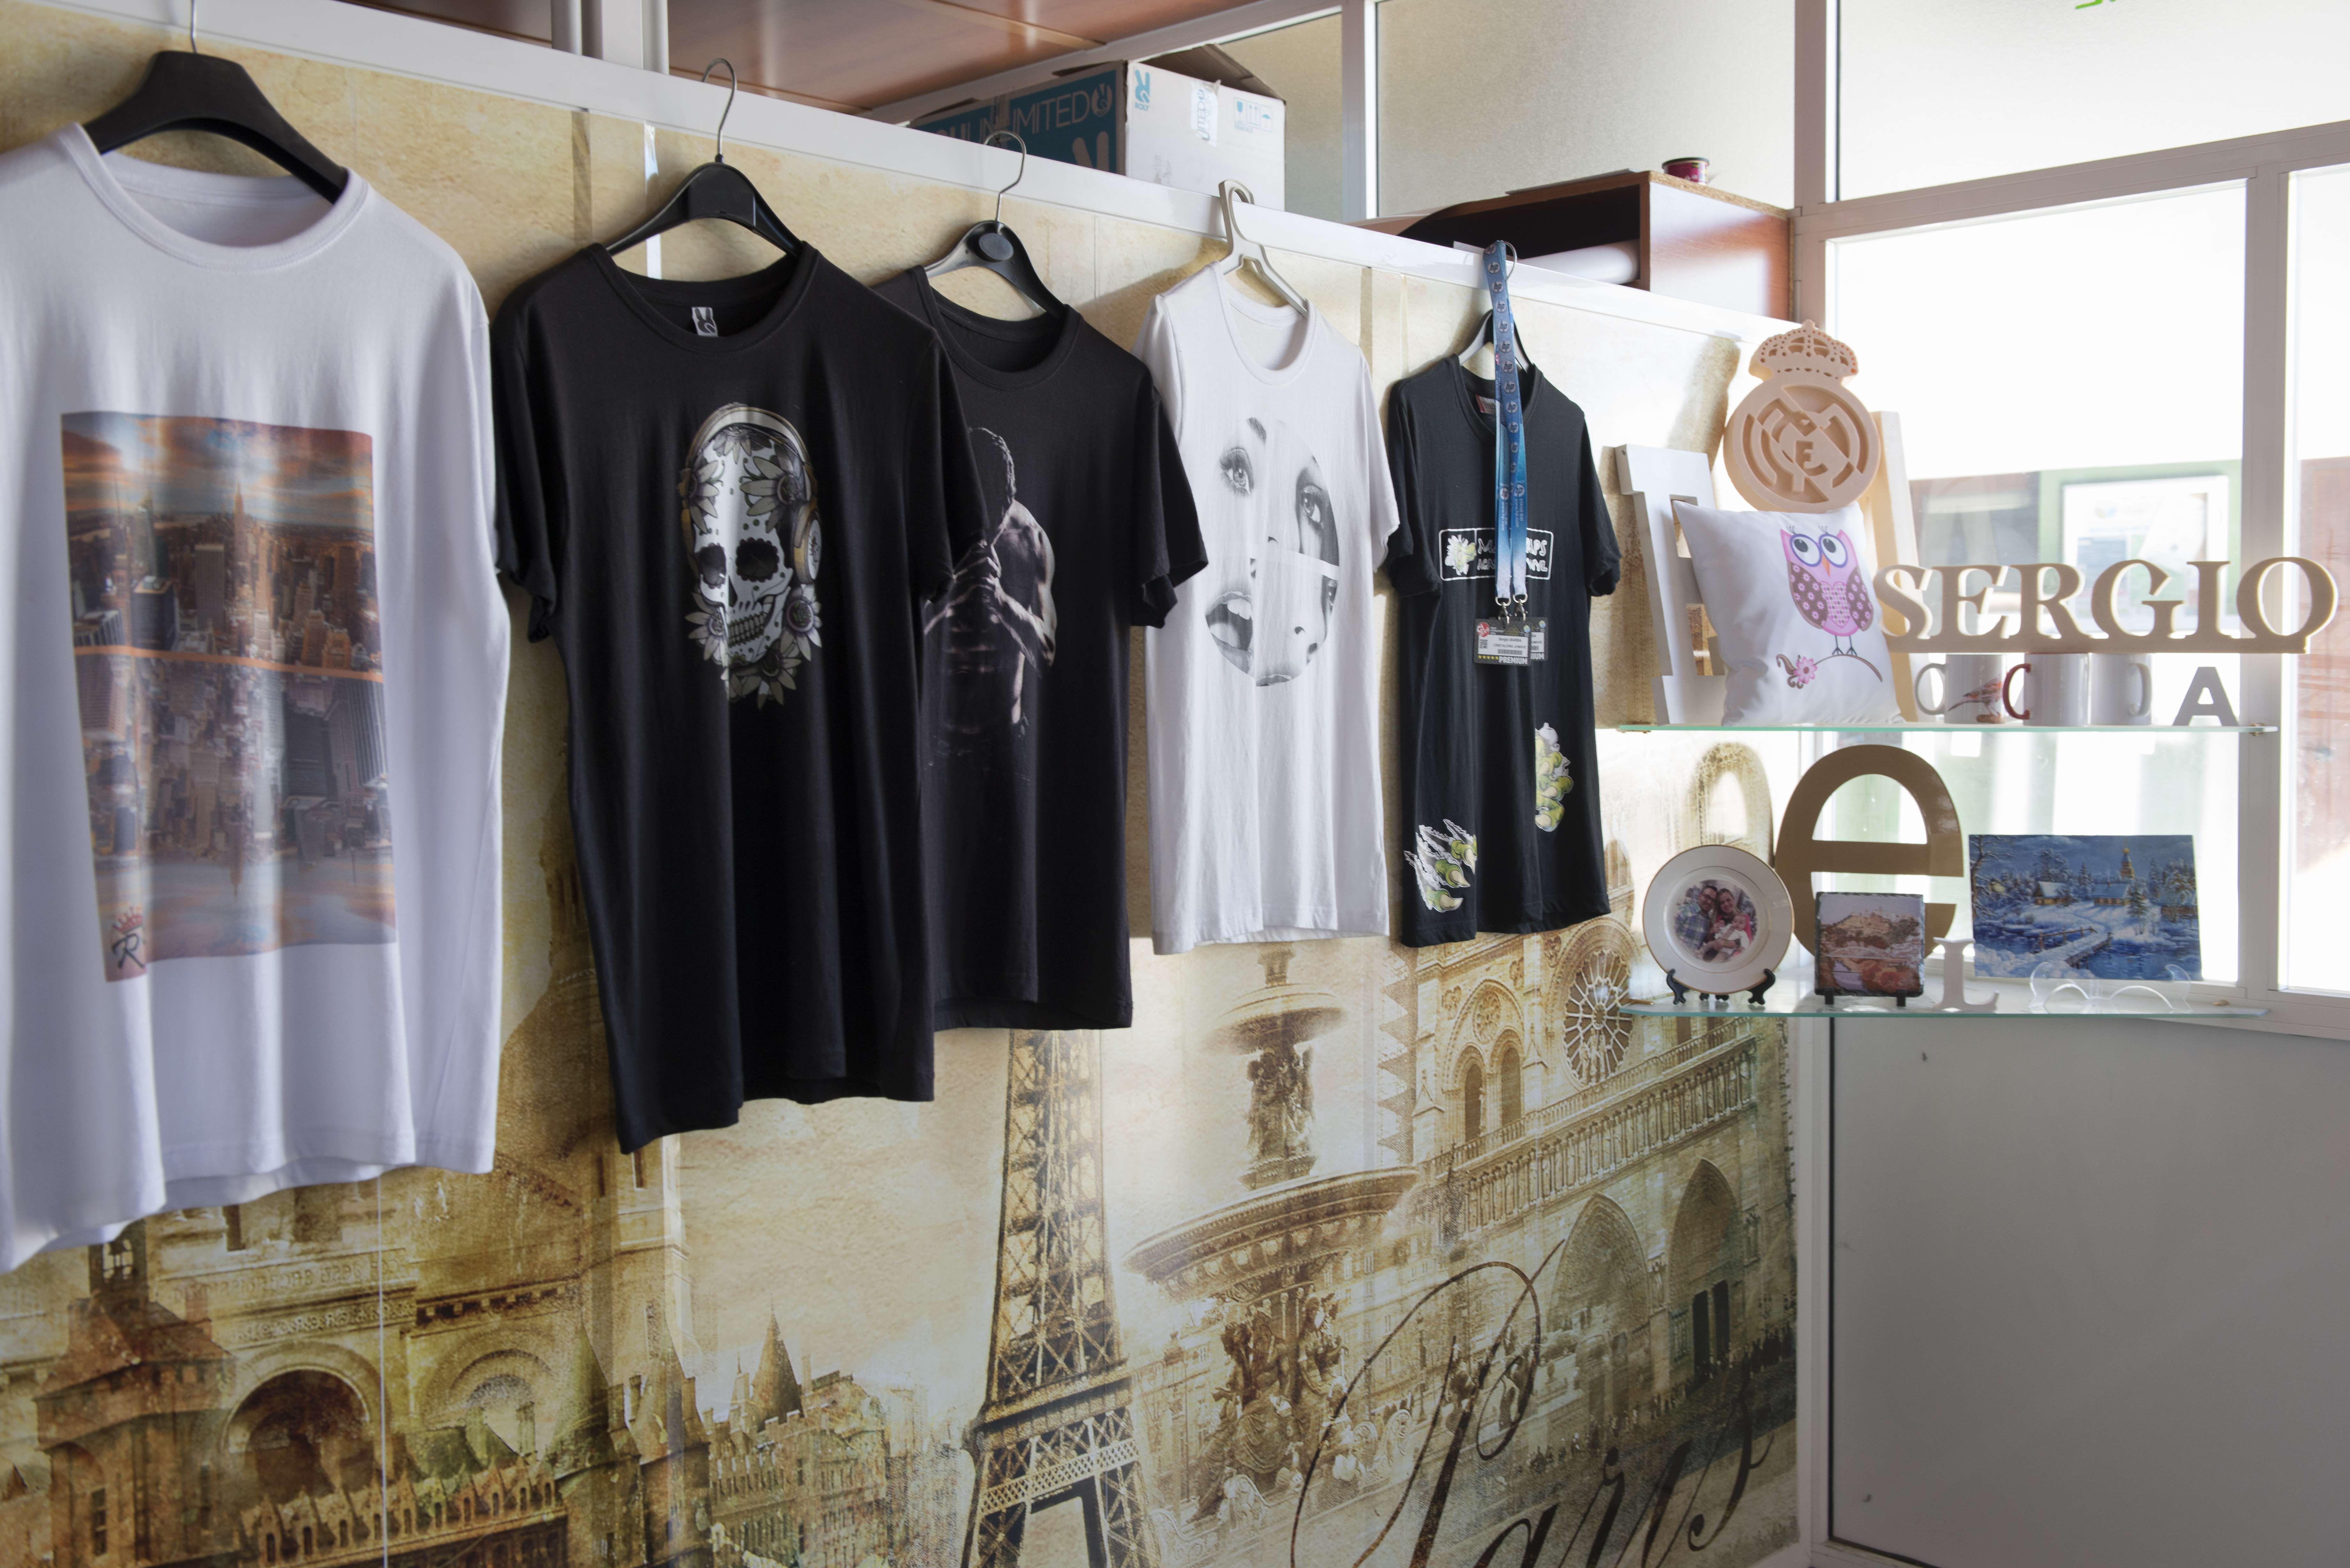 Impresión de camisetas en Cádiz